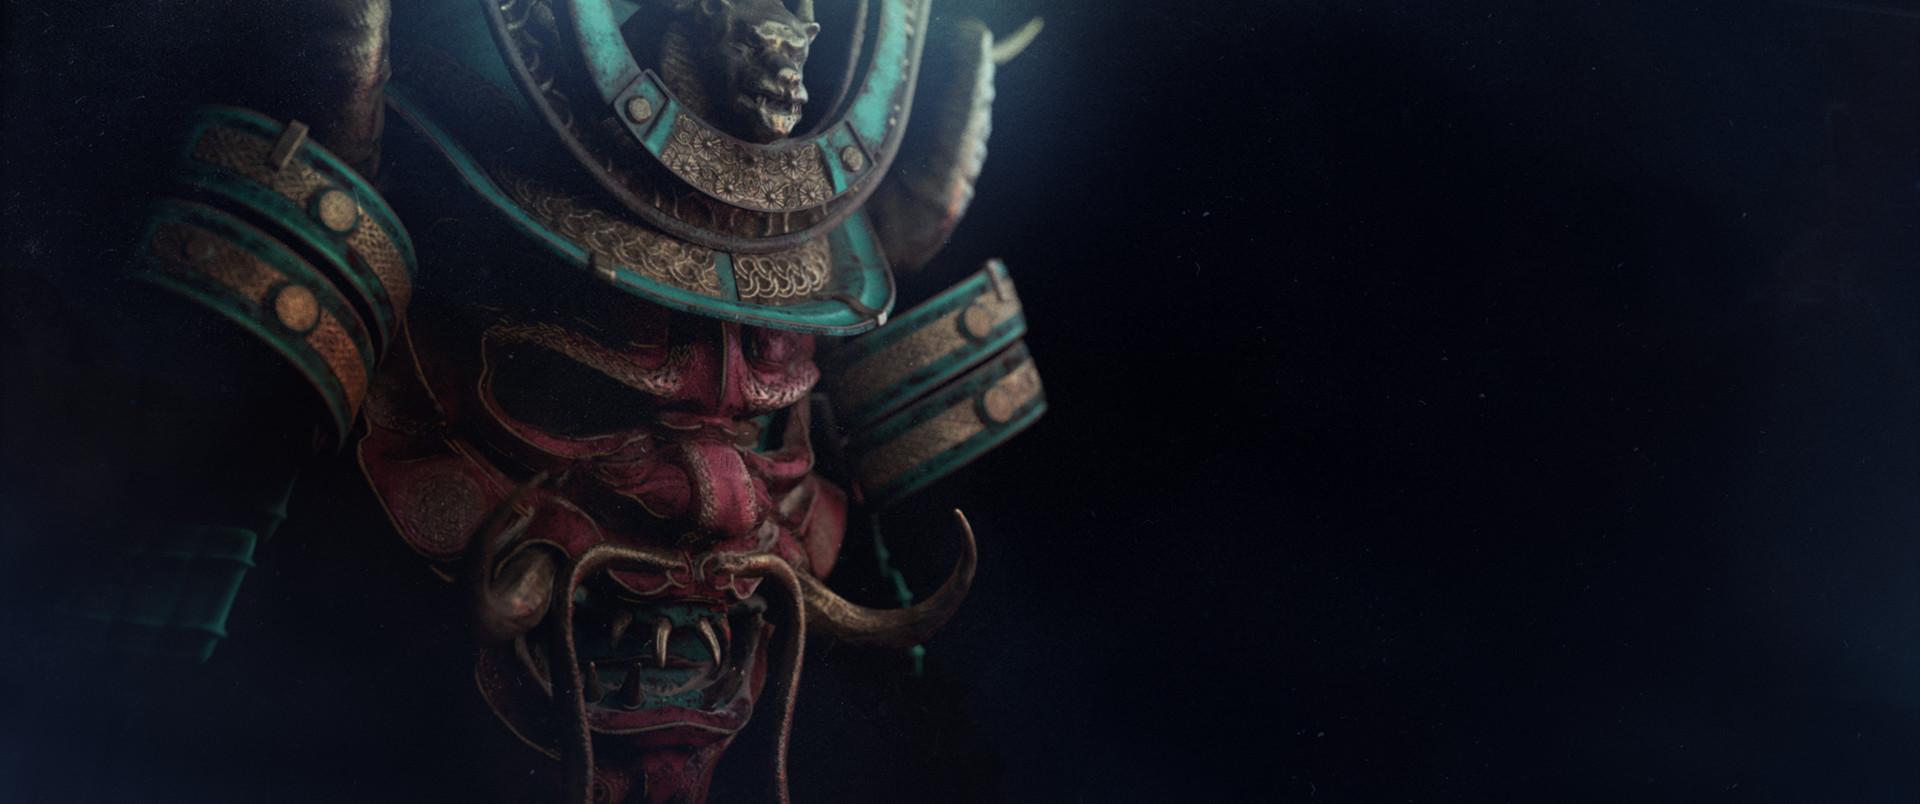 Ry cloze samurai 2